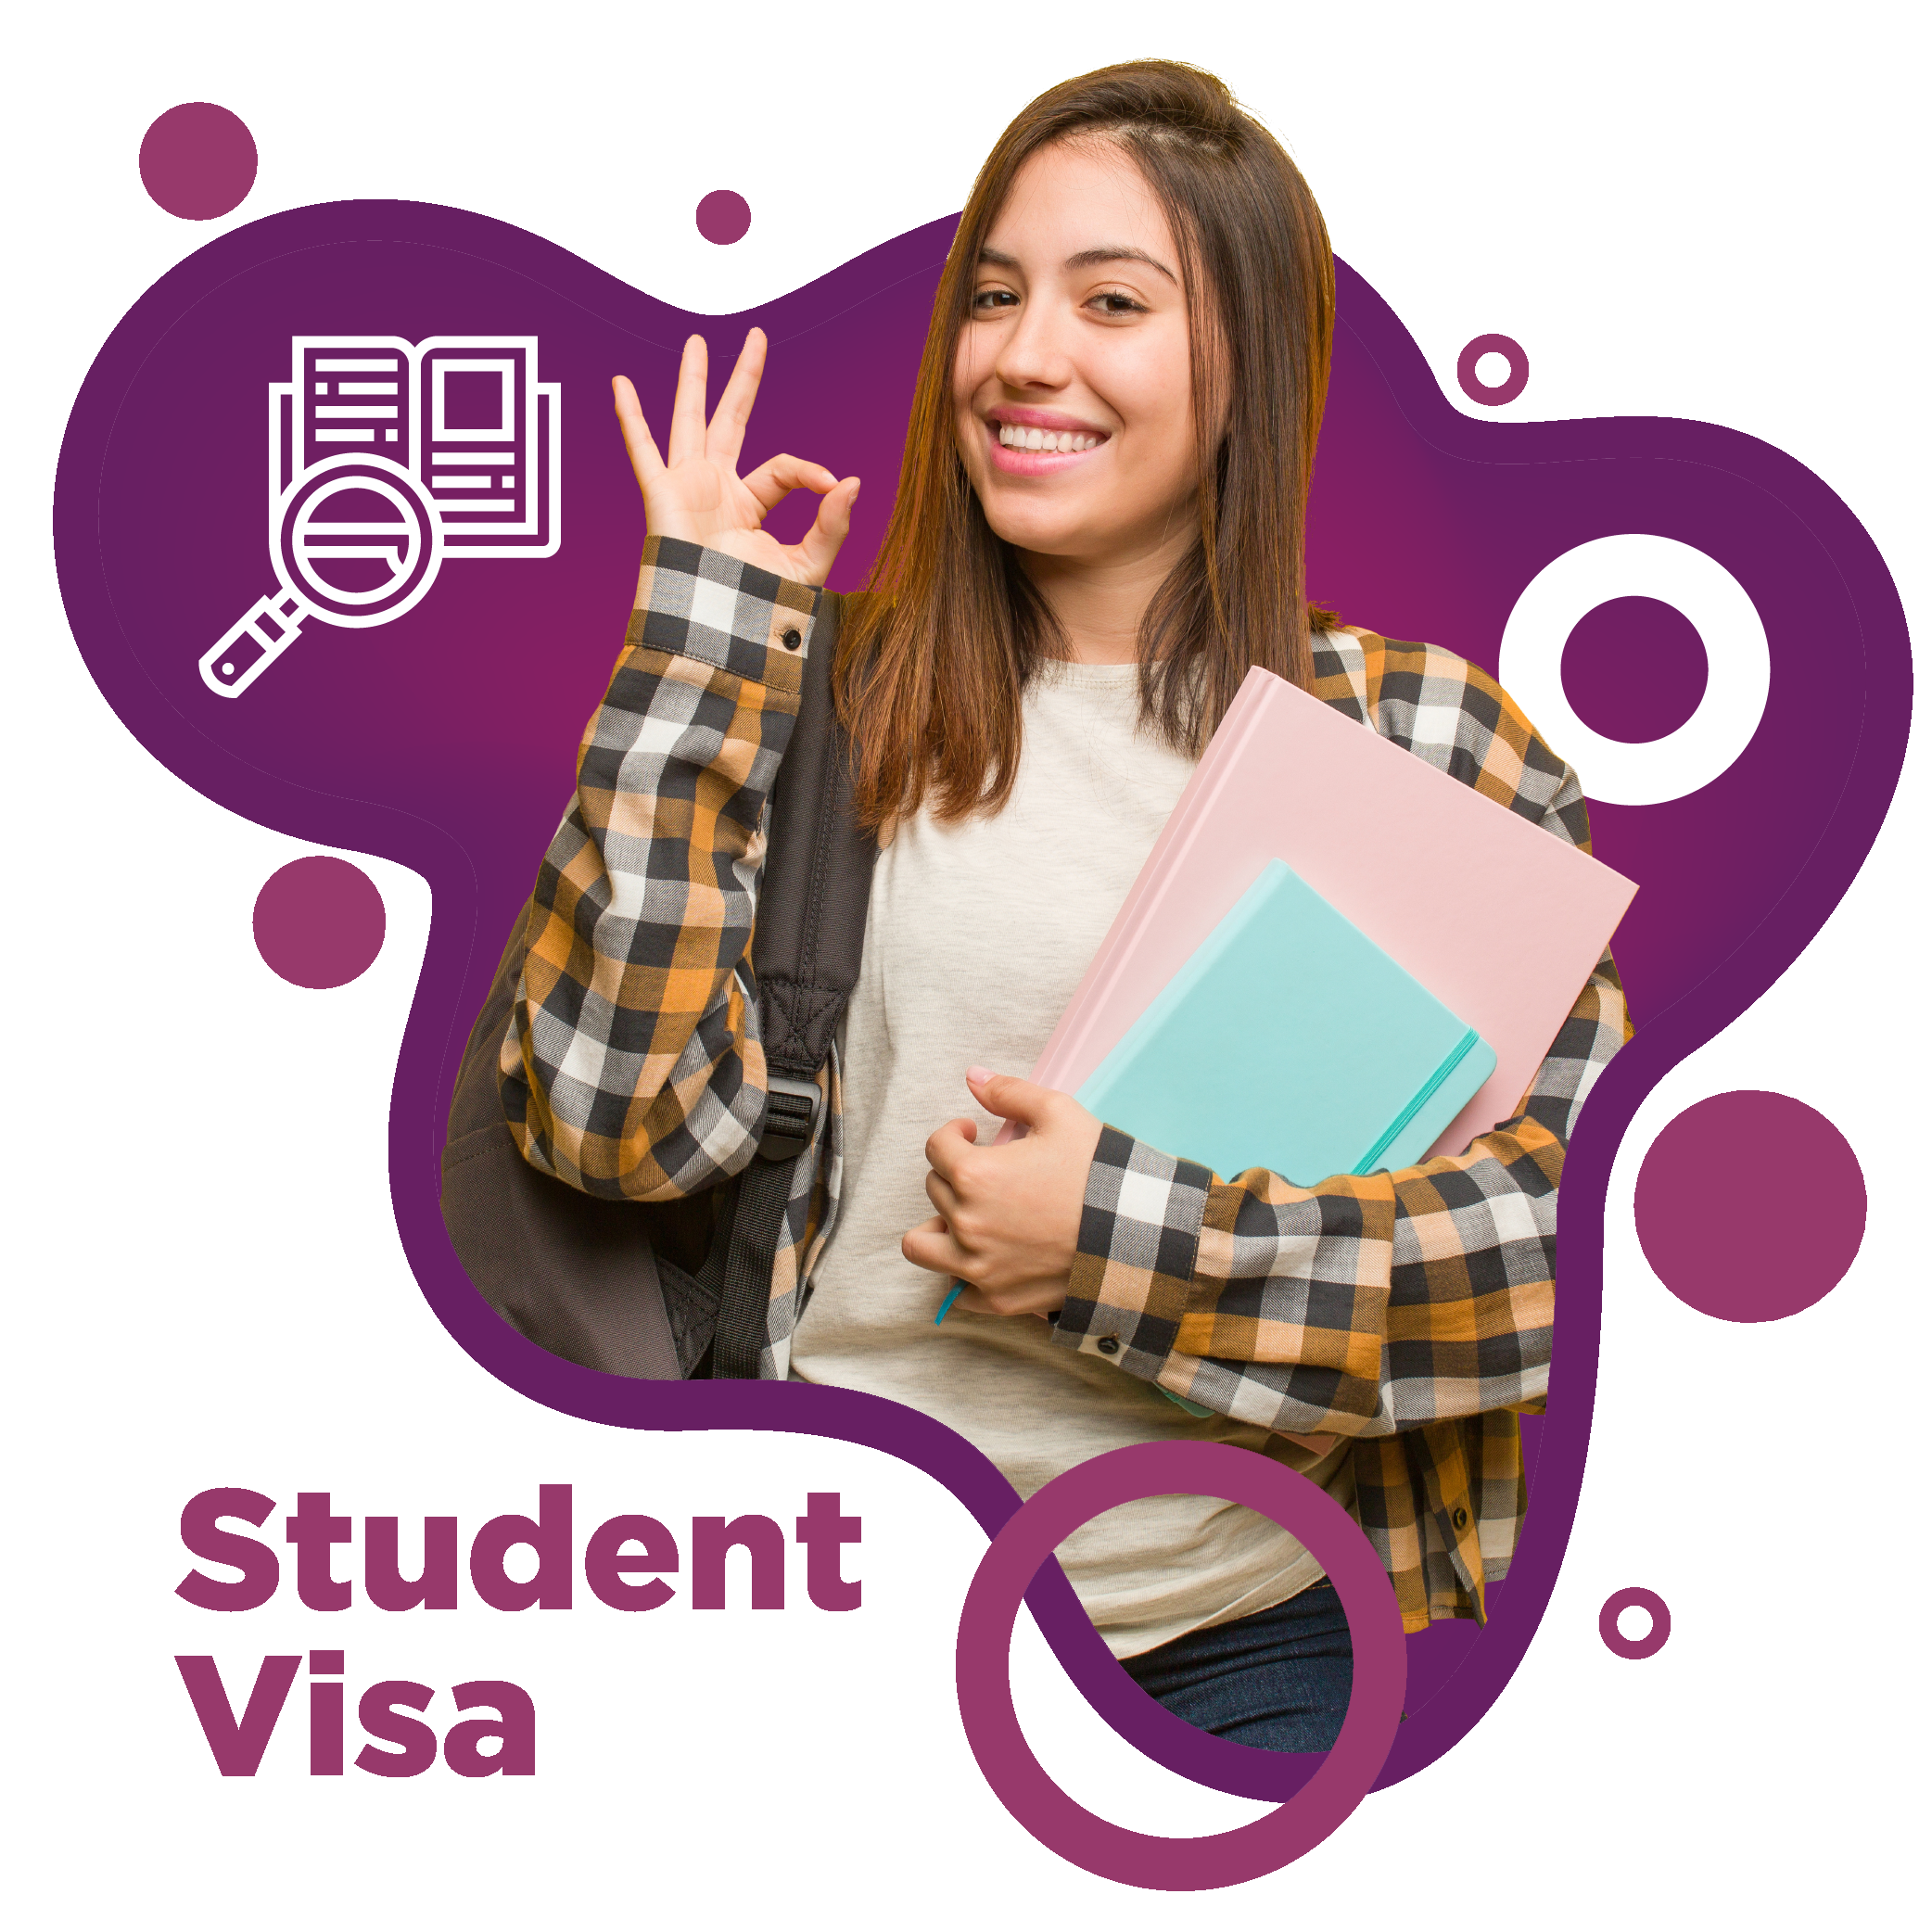 10-SN-Website-Menu-Section_S1tudent-Visa-1MigrationServices.png